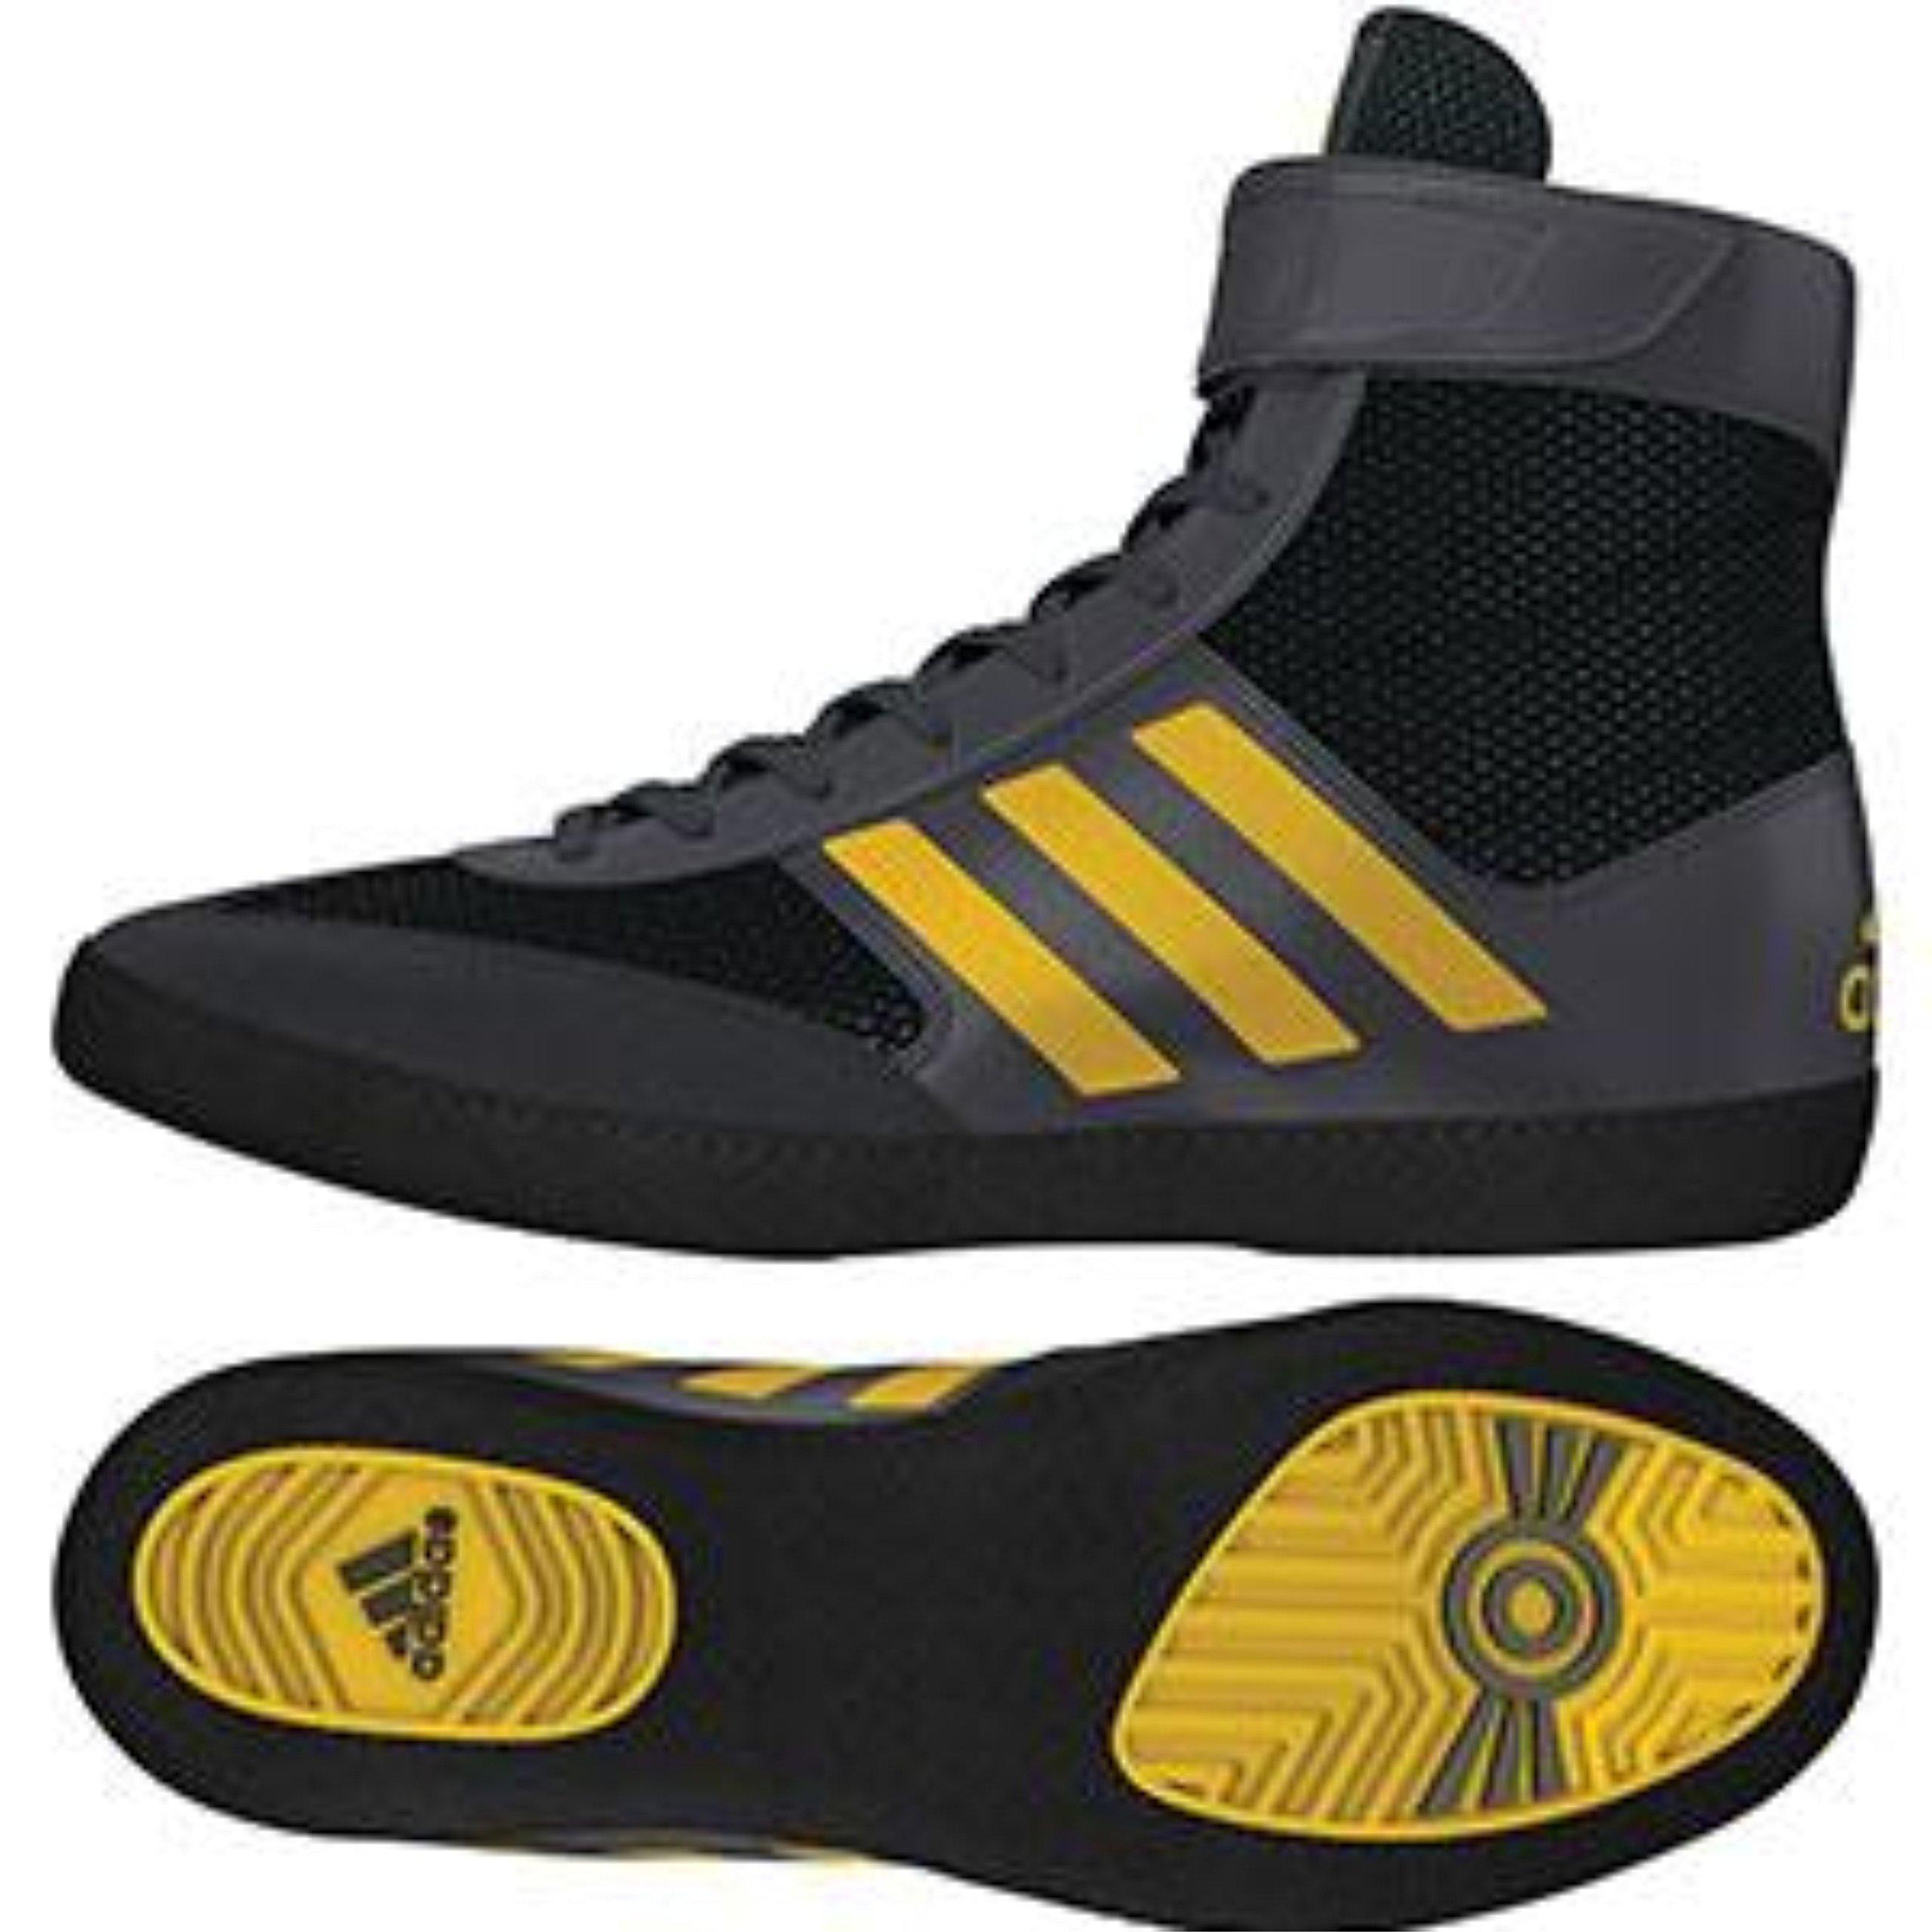 adidas Performance Men's Combat Speed.5, Grey/Eqt Yellow/Utility Black, 10 M US by adidas